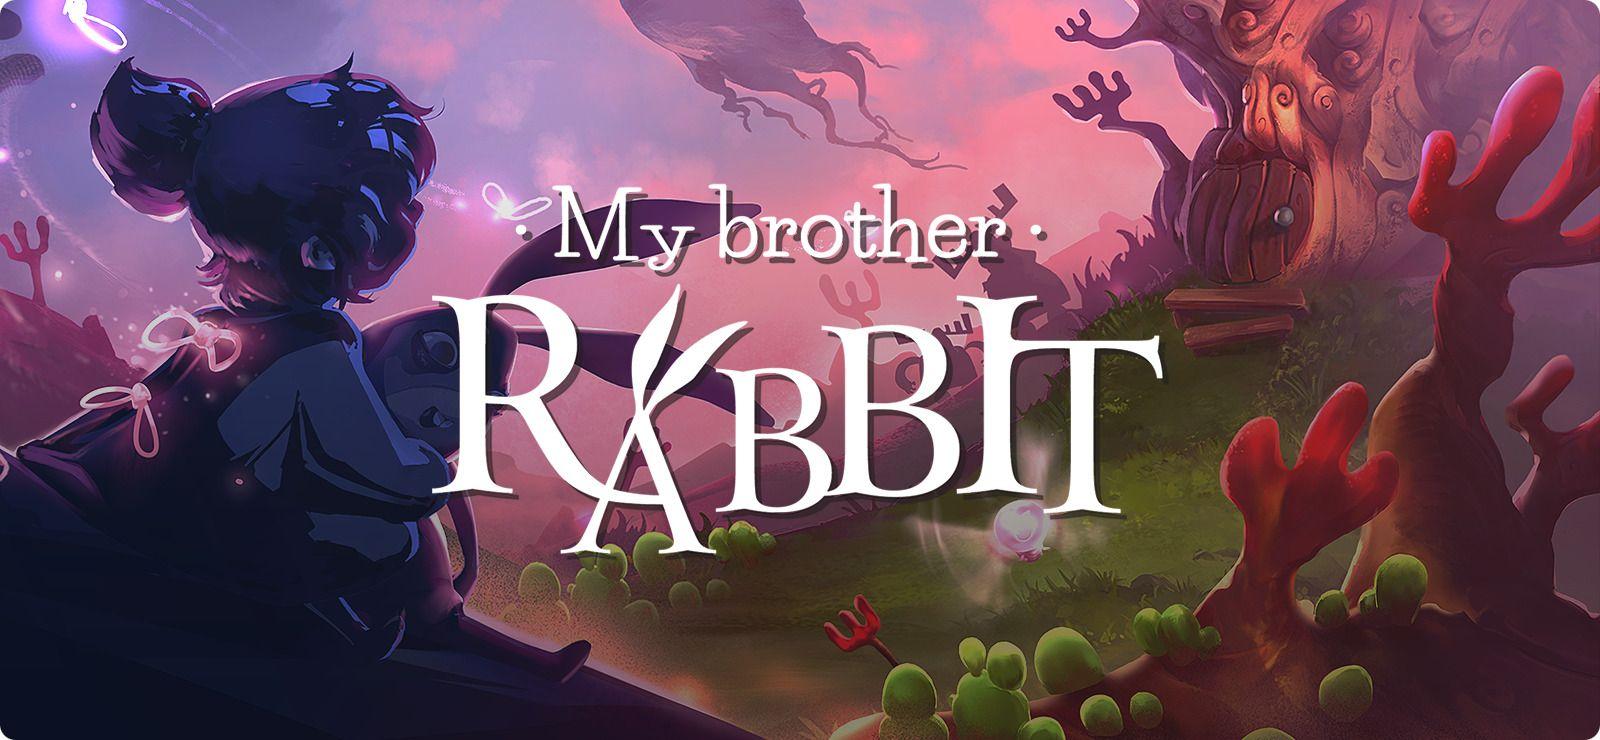 My brother rabbit - Quai10